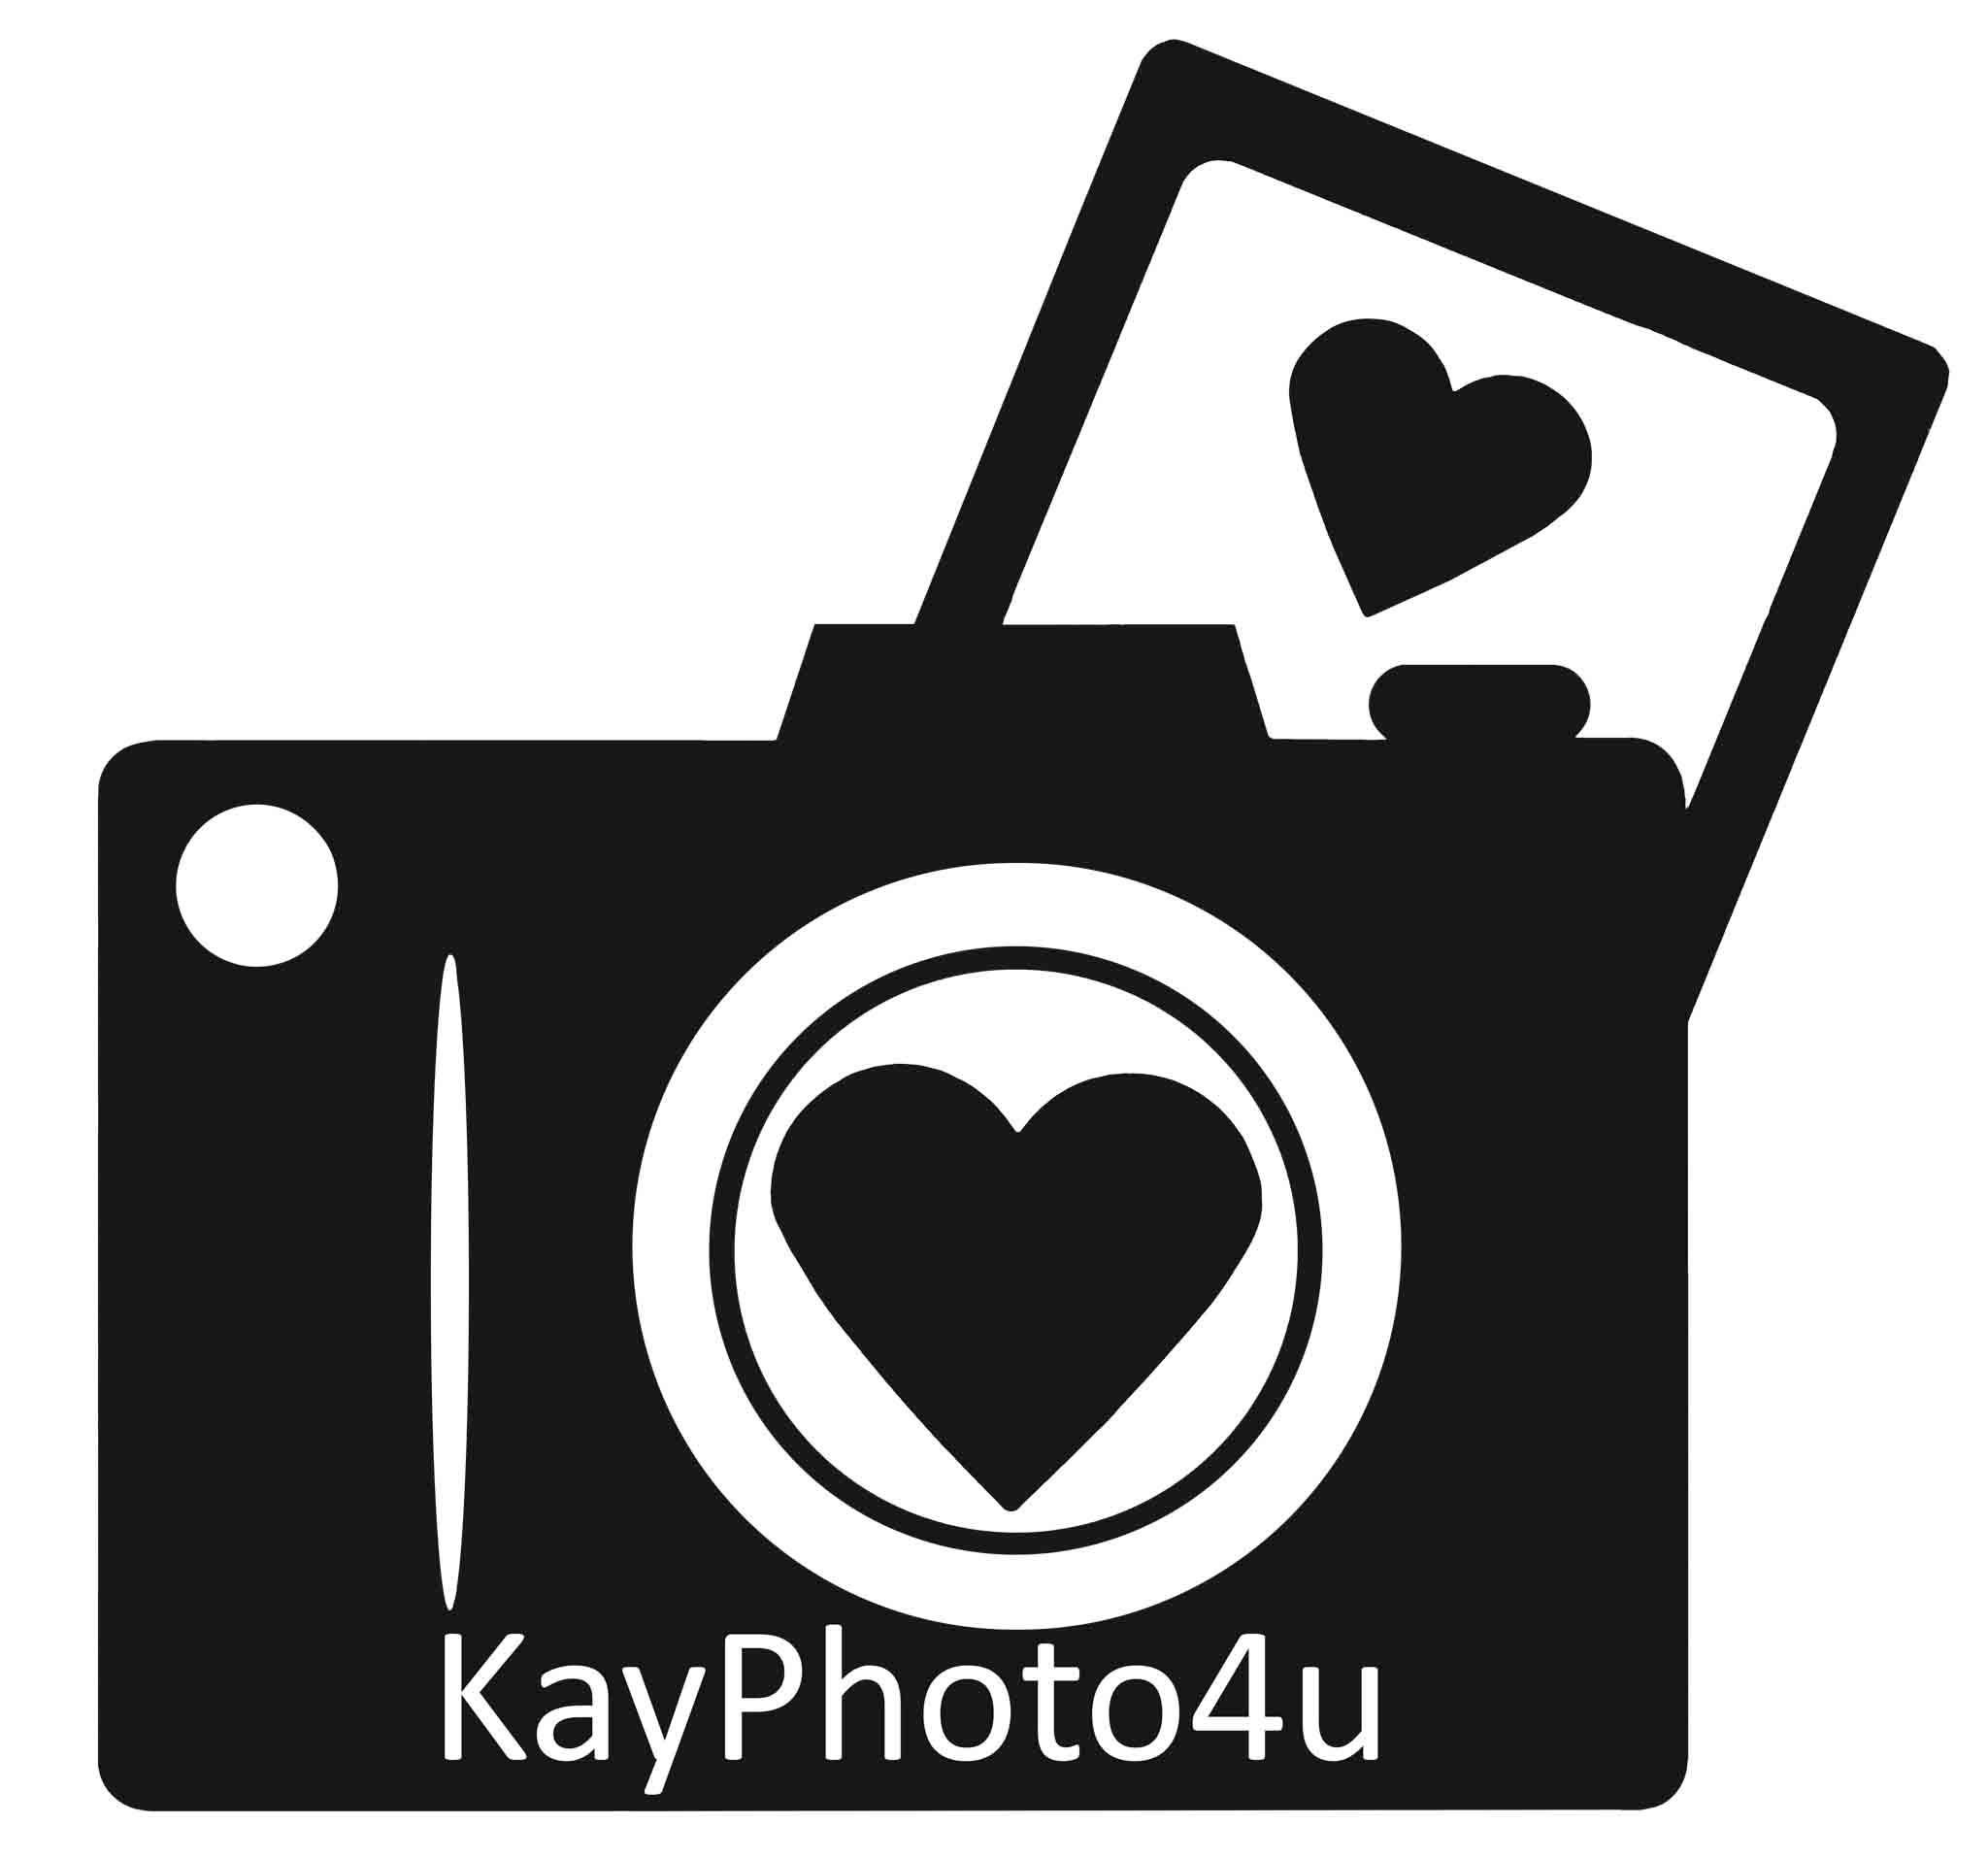 KayPhoto4u